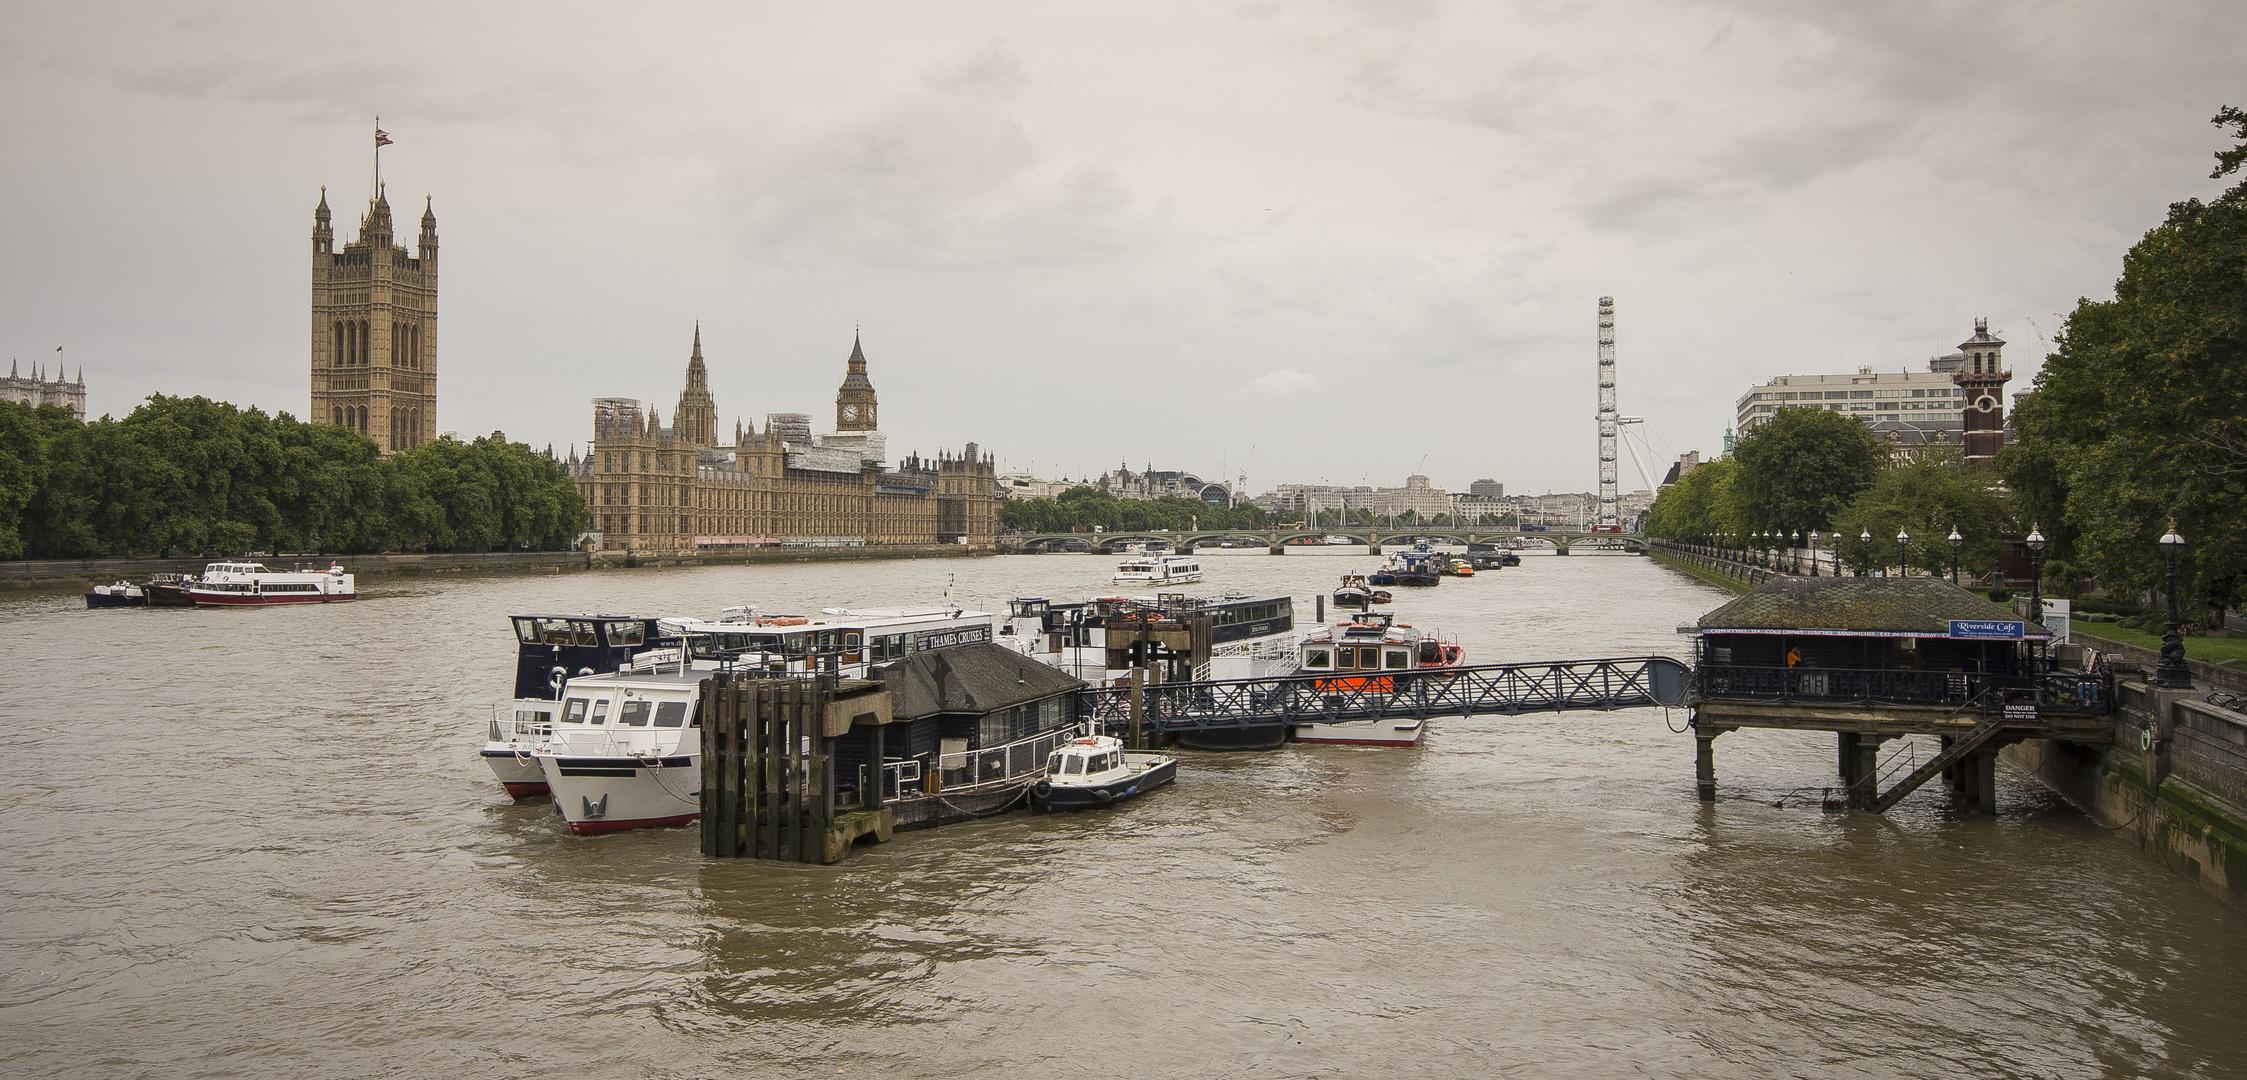 Houses of Parliament seen from Lambeth Bridge - 06